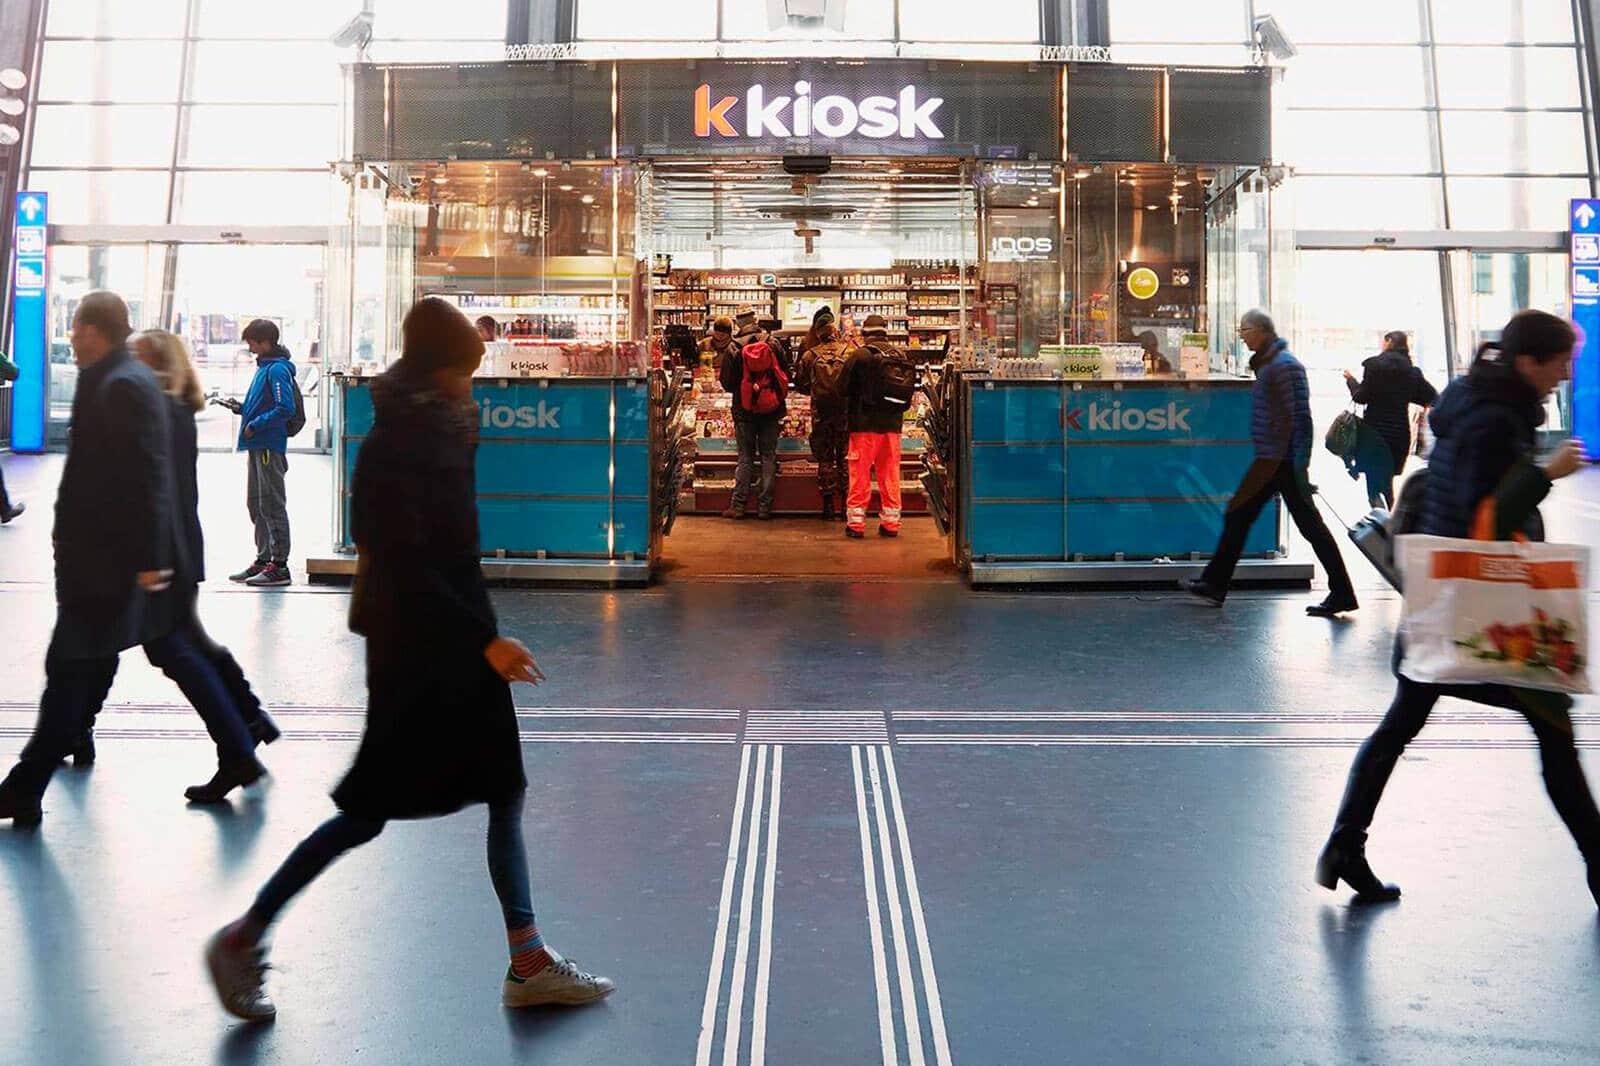 k kiosk, offline, online, services, Valora, numérisation, retail